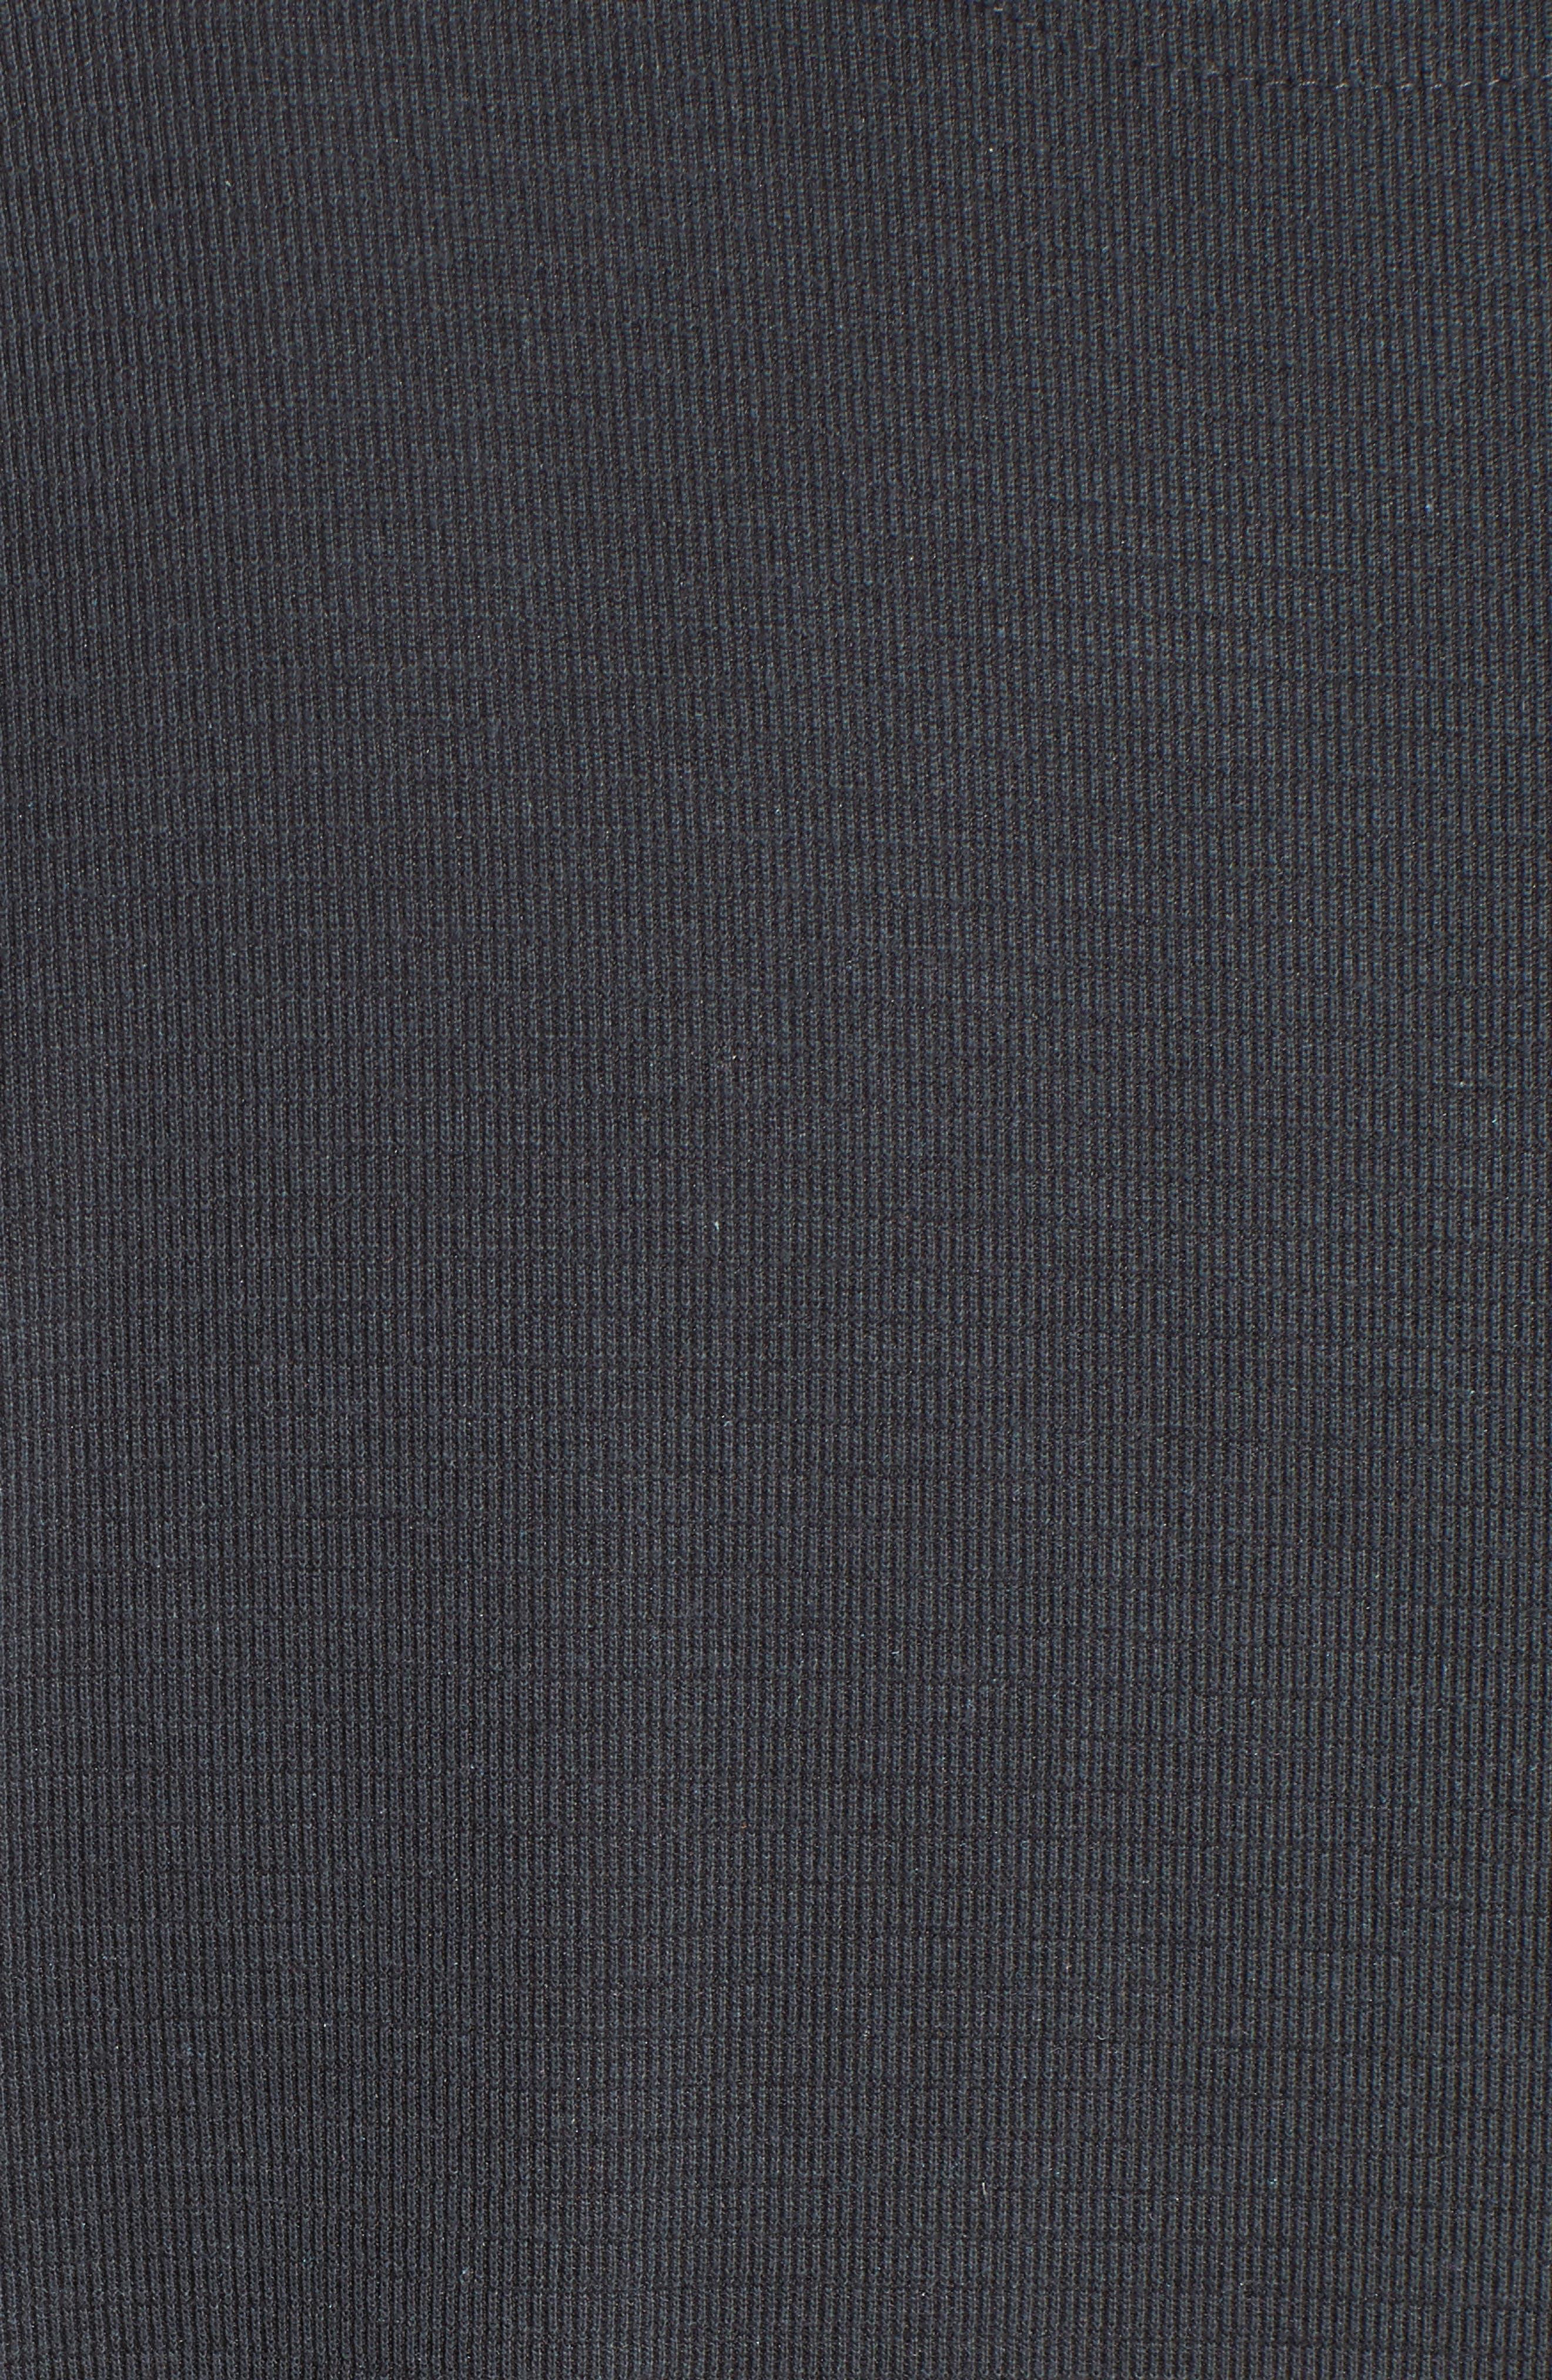 Crewneck T-Shirt,                             Alternate thumbnail 5, color,                             001